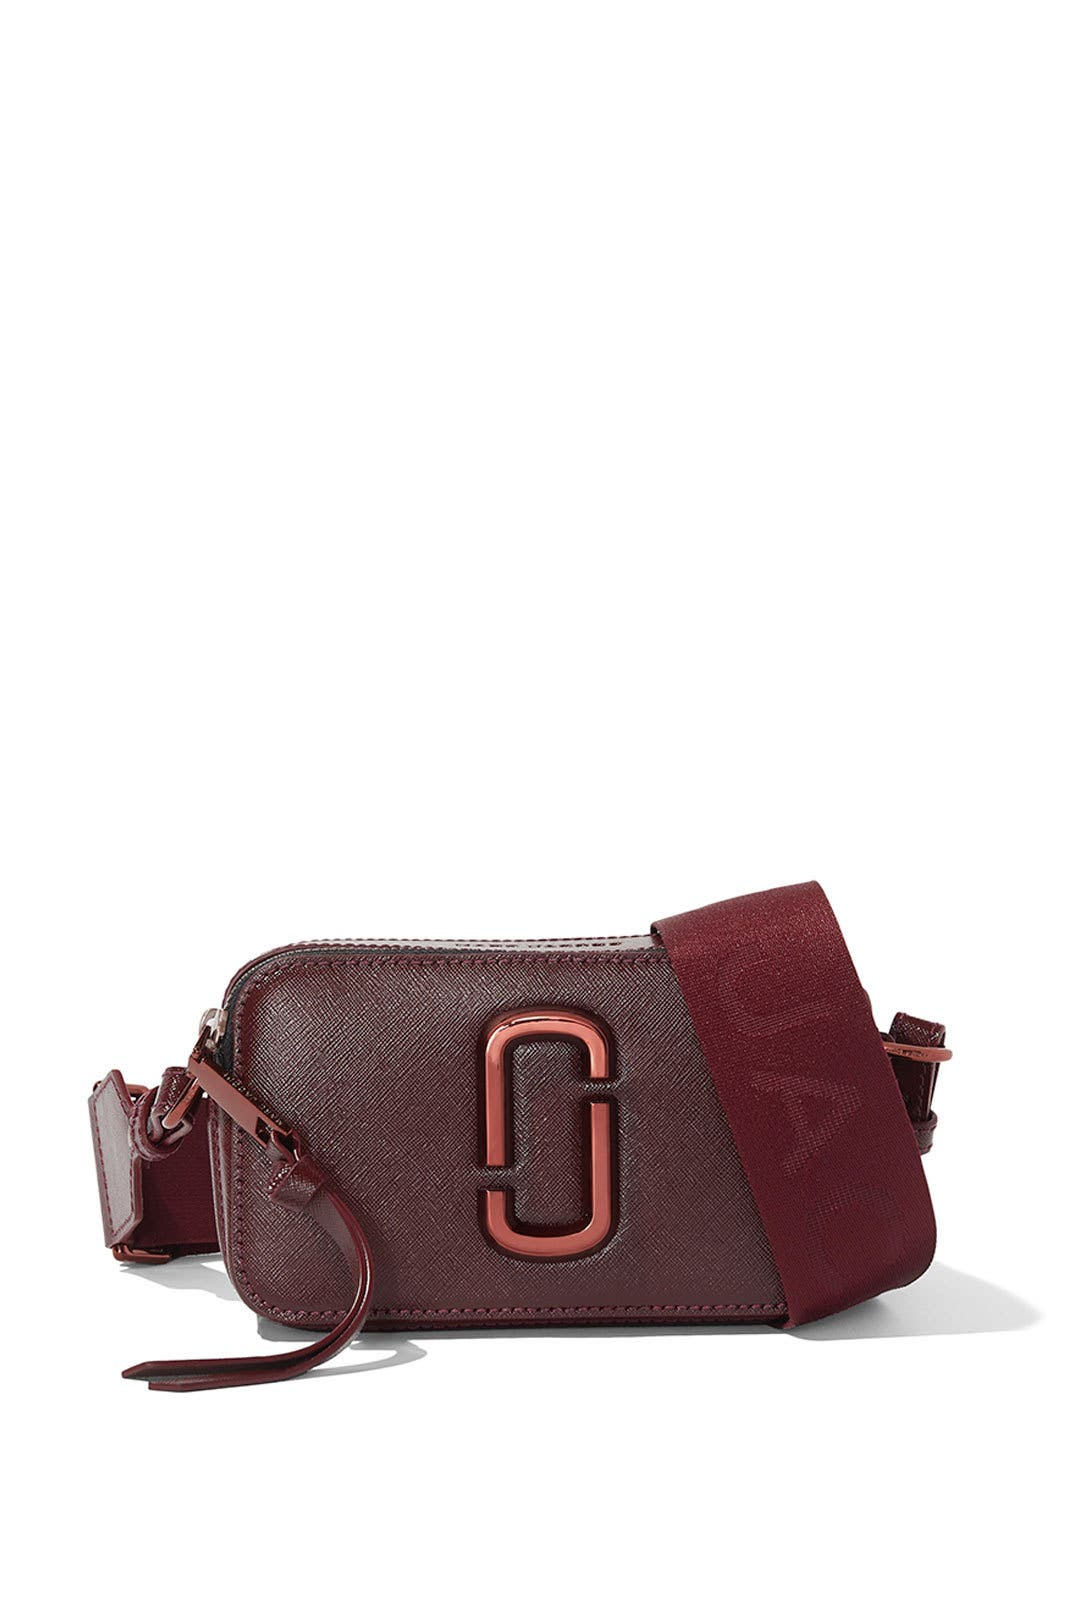 Marc Jacobs Handbags The Wine Snapshot Crossbody